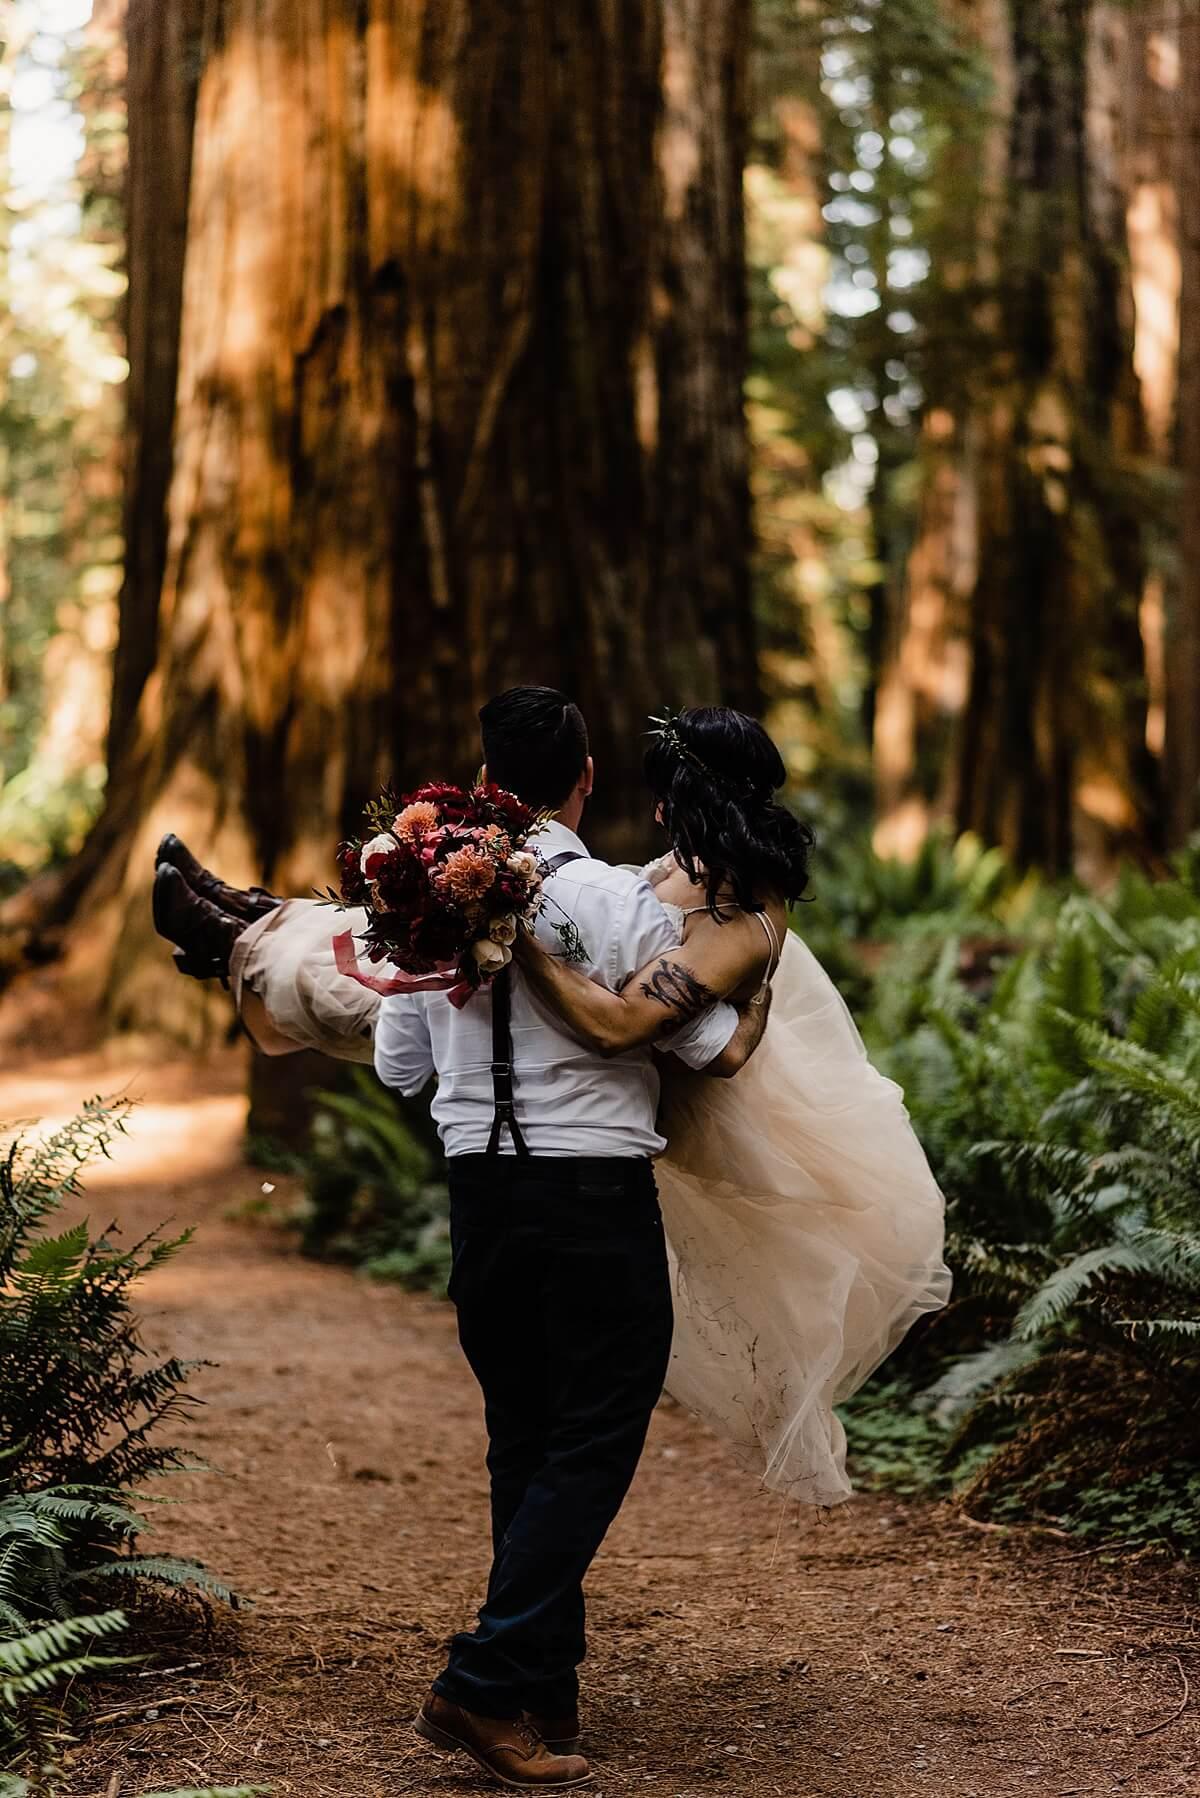 Allison-Brooks-Jedediah-Smiith-Redwoods-Adventure-Elopement-Wedding-S-Photography-Blog_0033.jpg